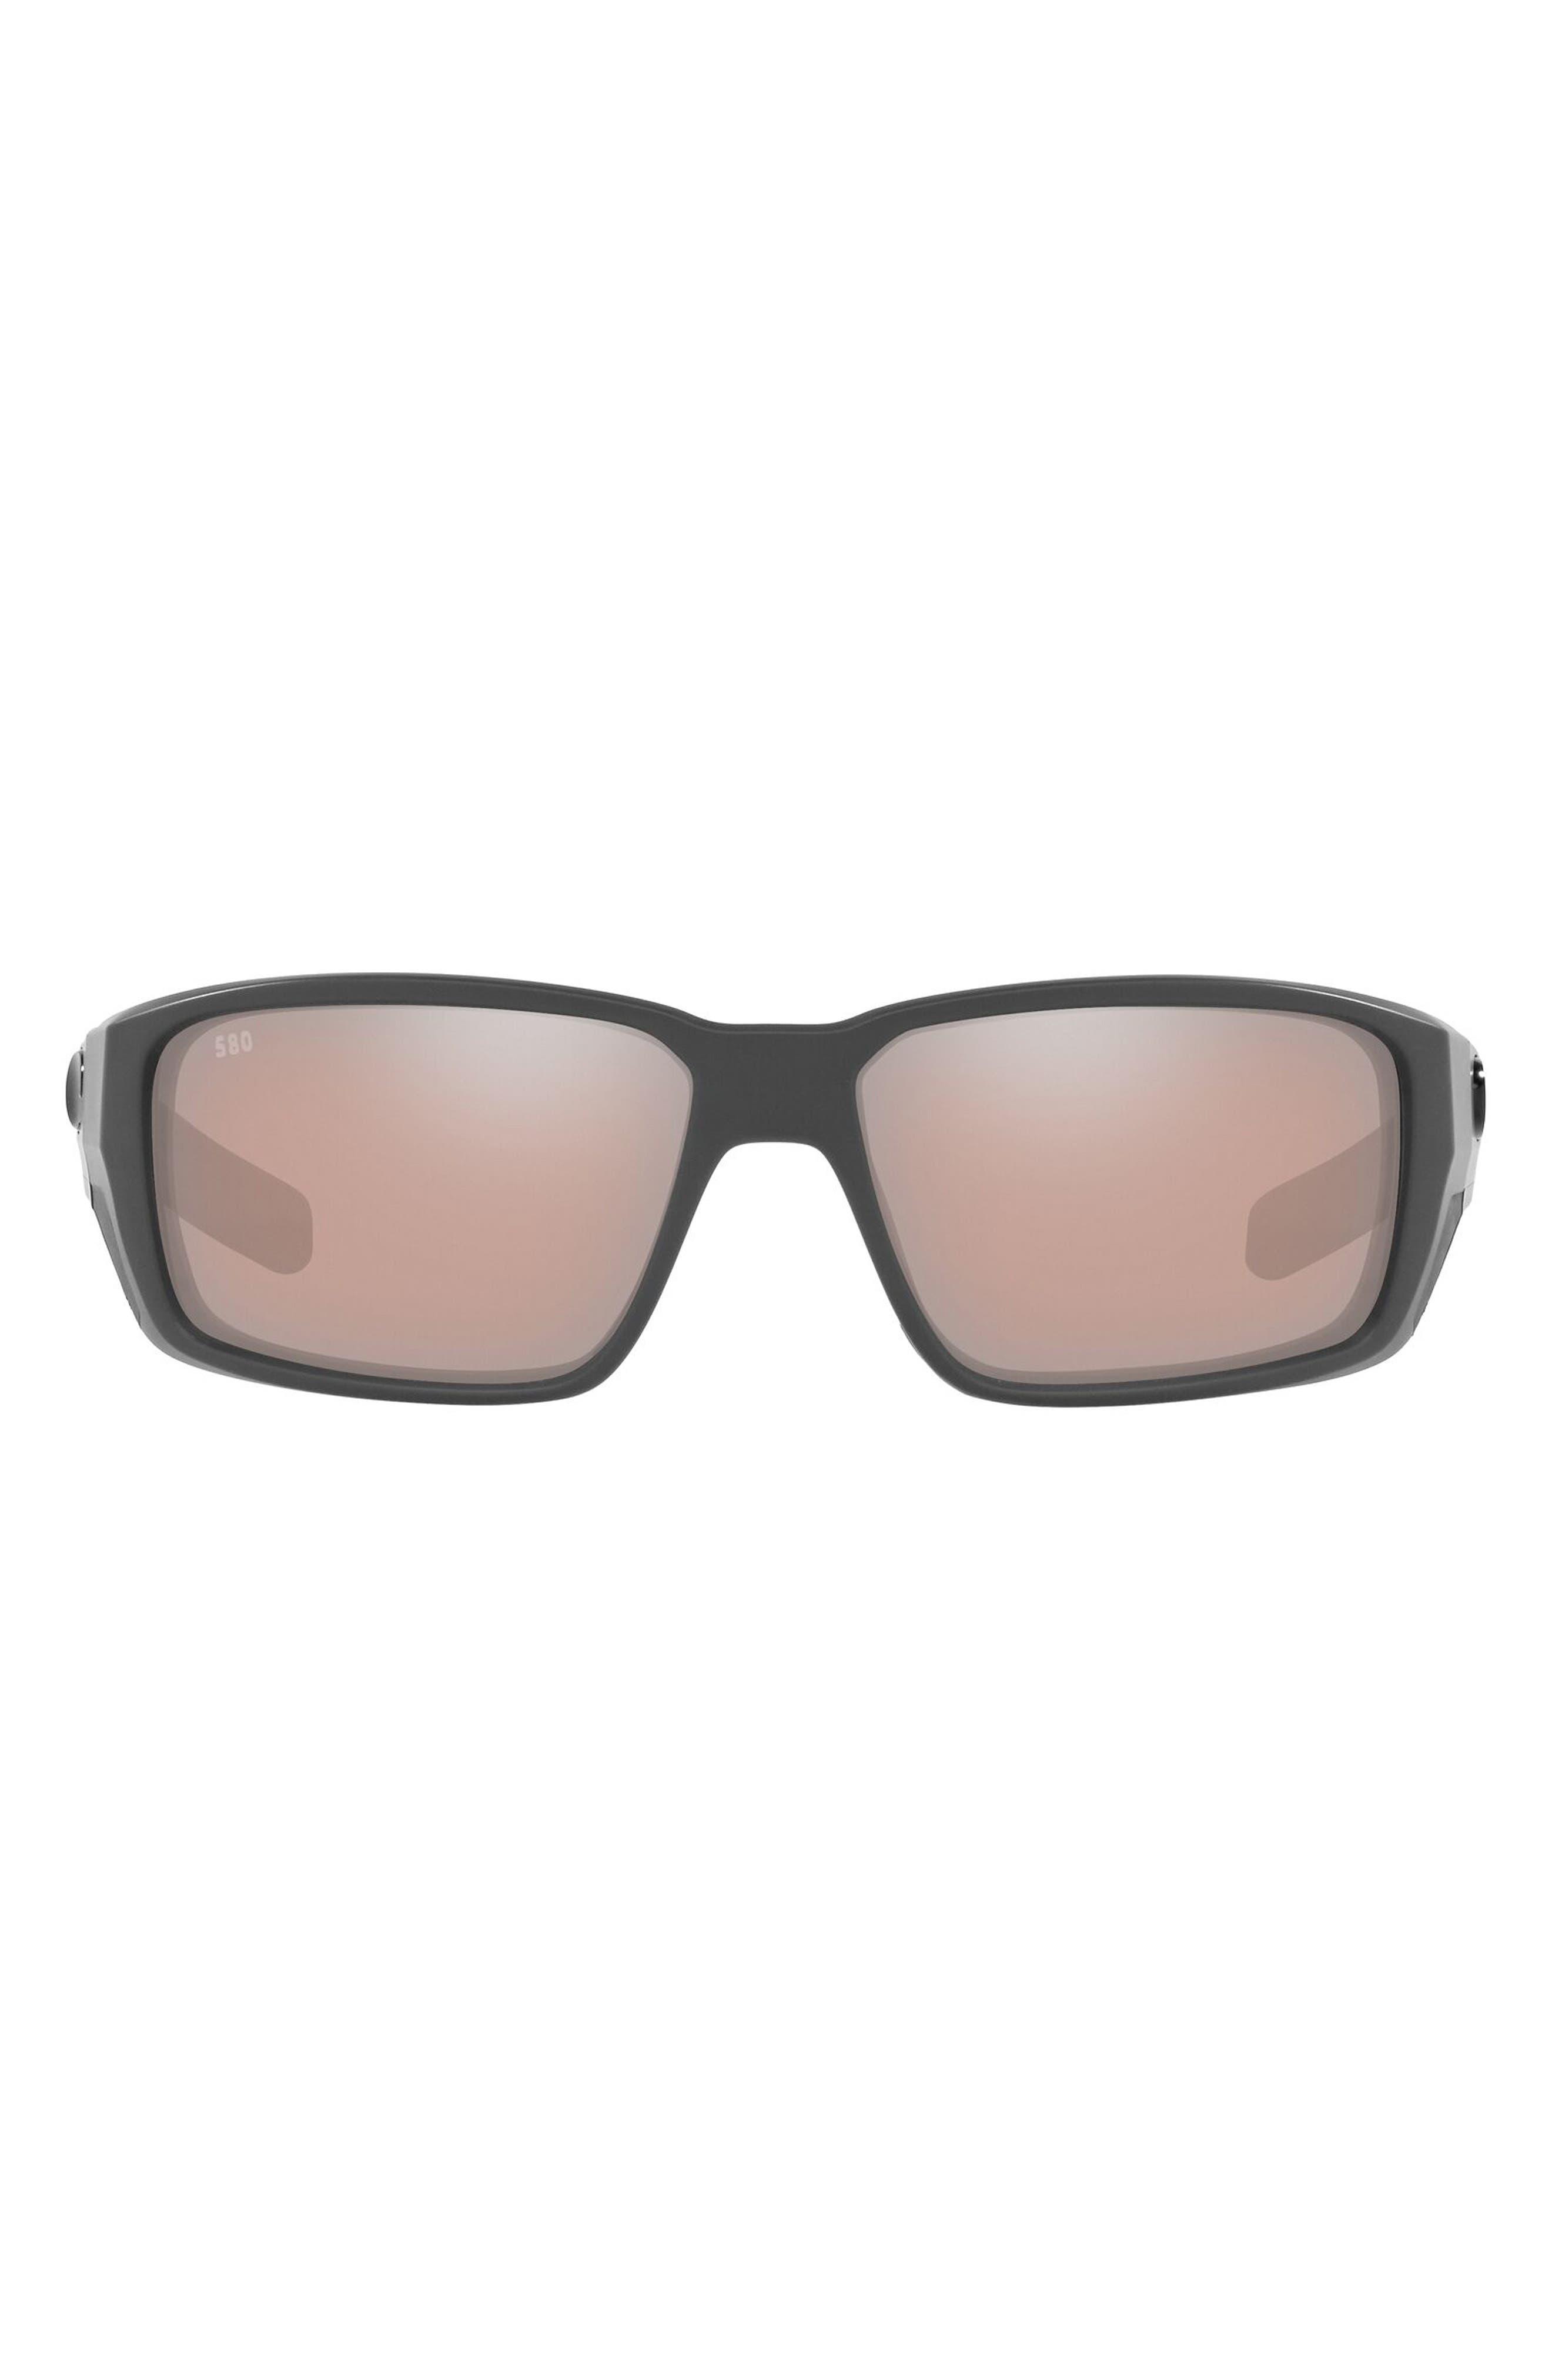 Fantail Pro 60mm Polarized Sunglasses